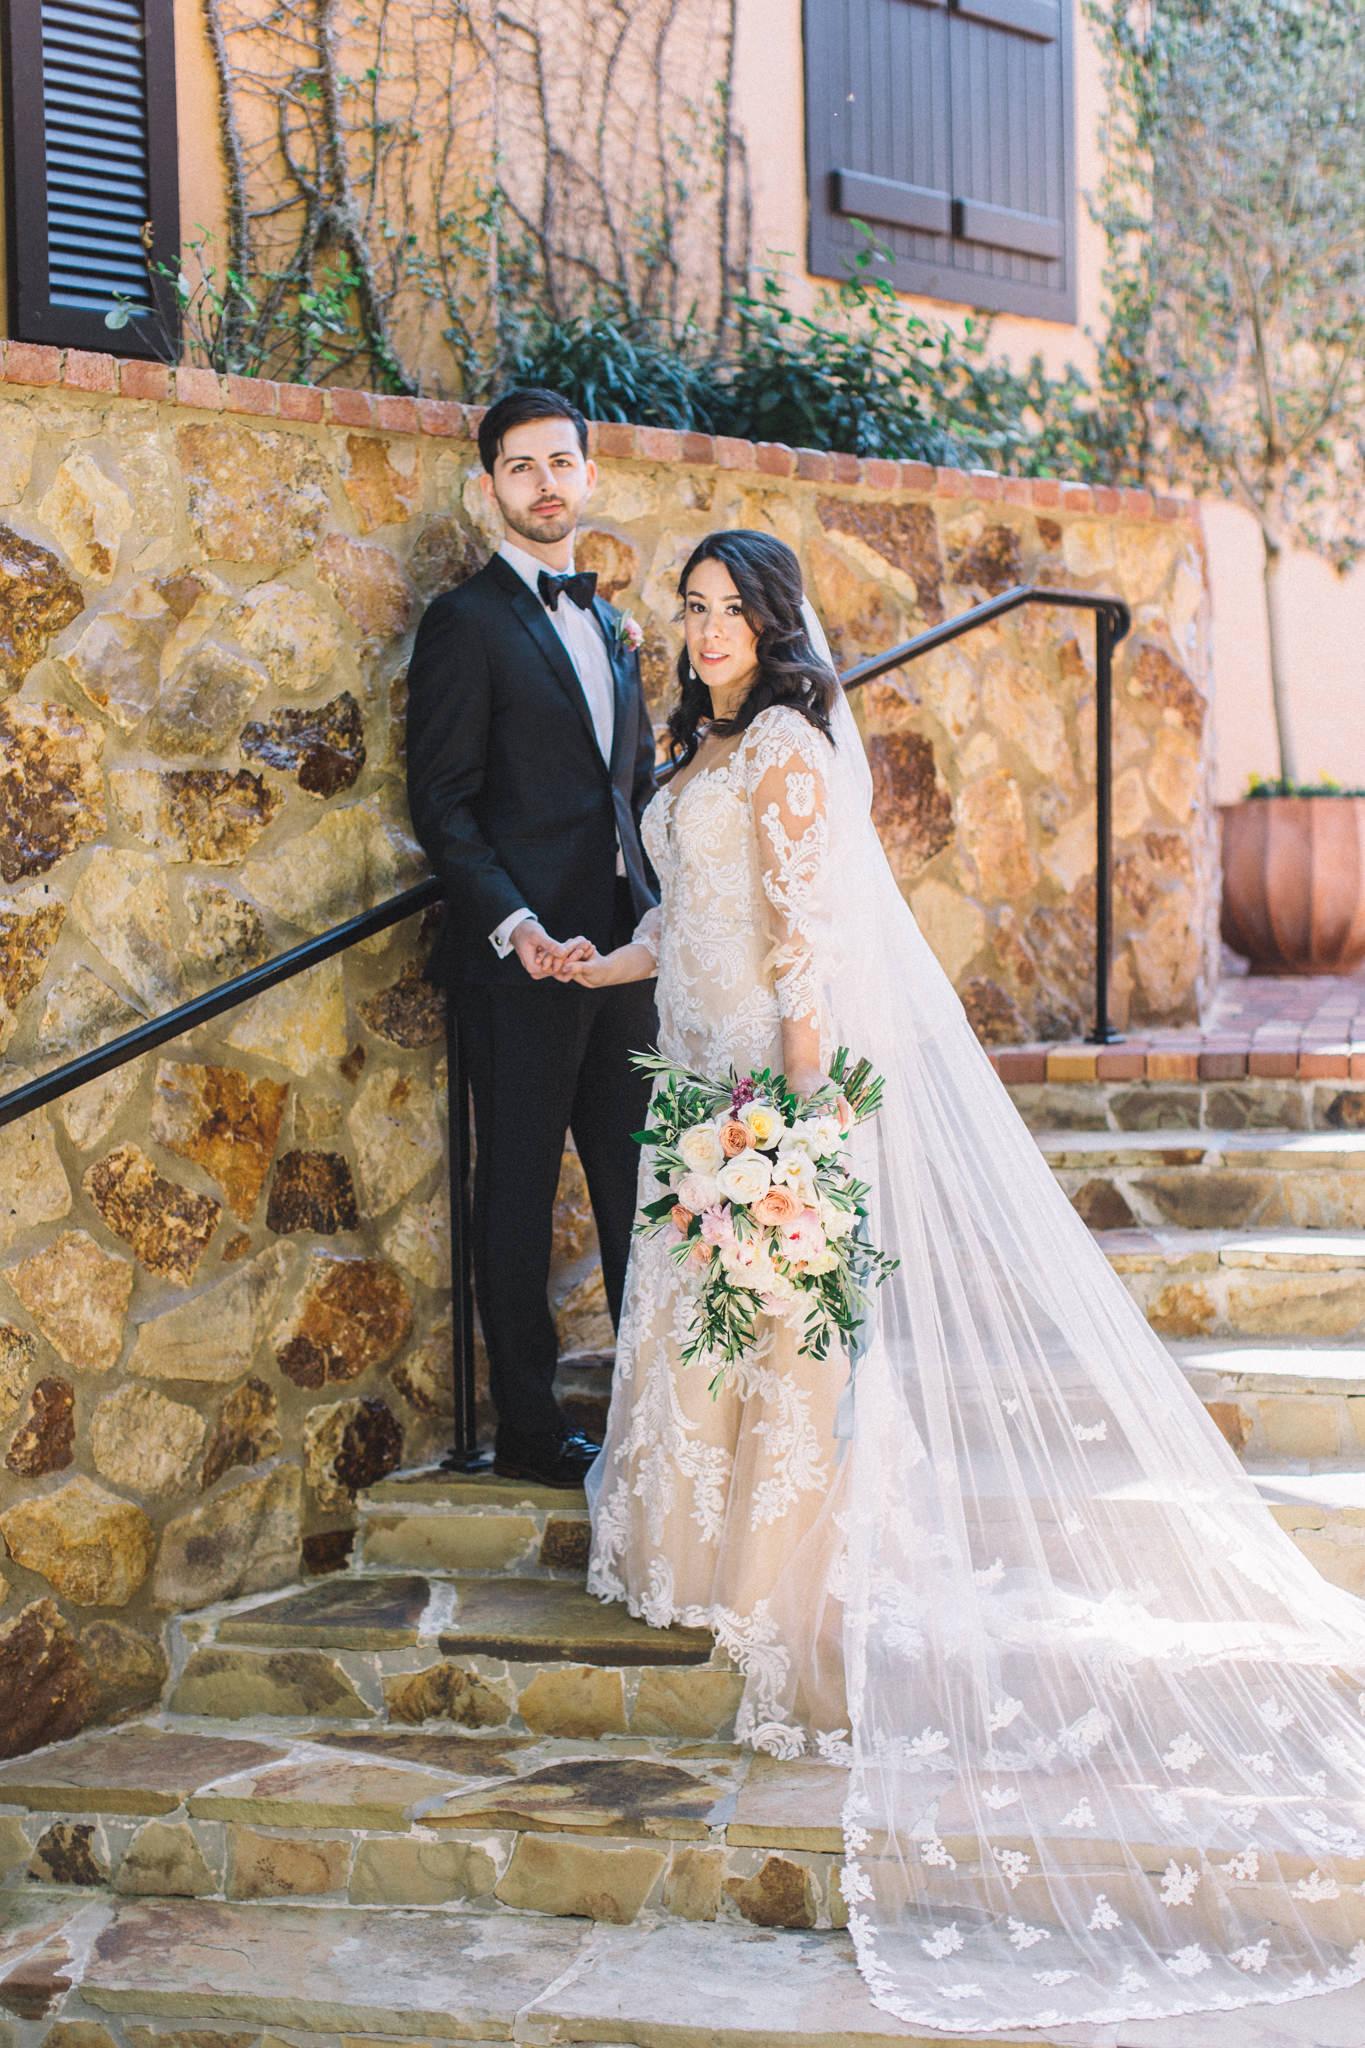 bride with groom professional portraits in bridal attire